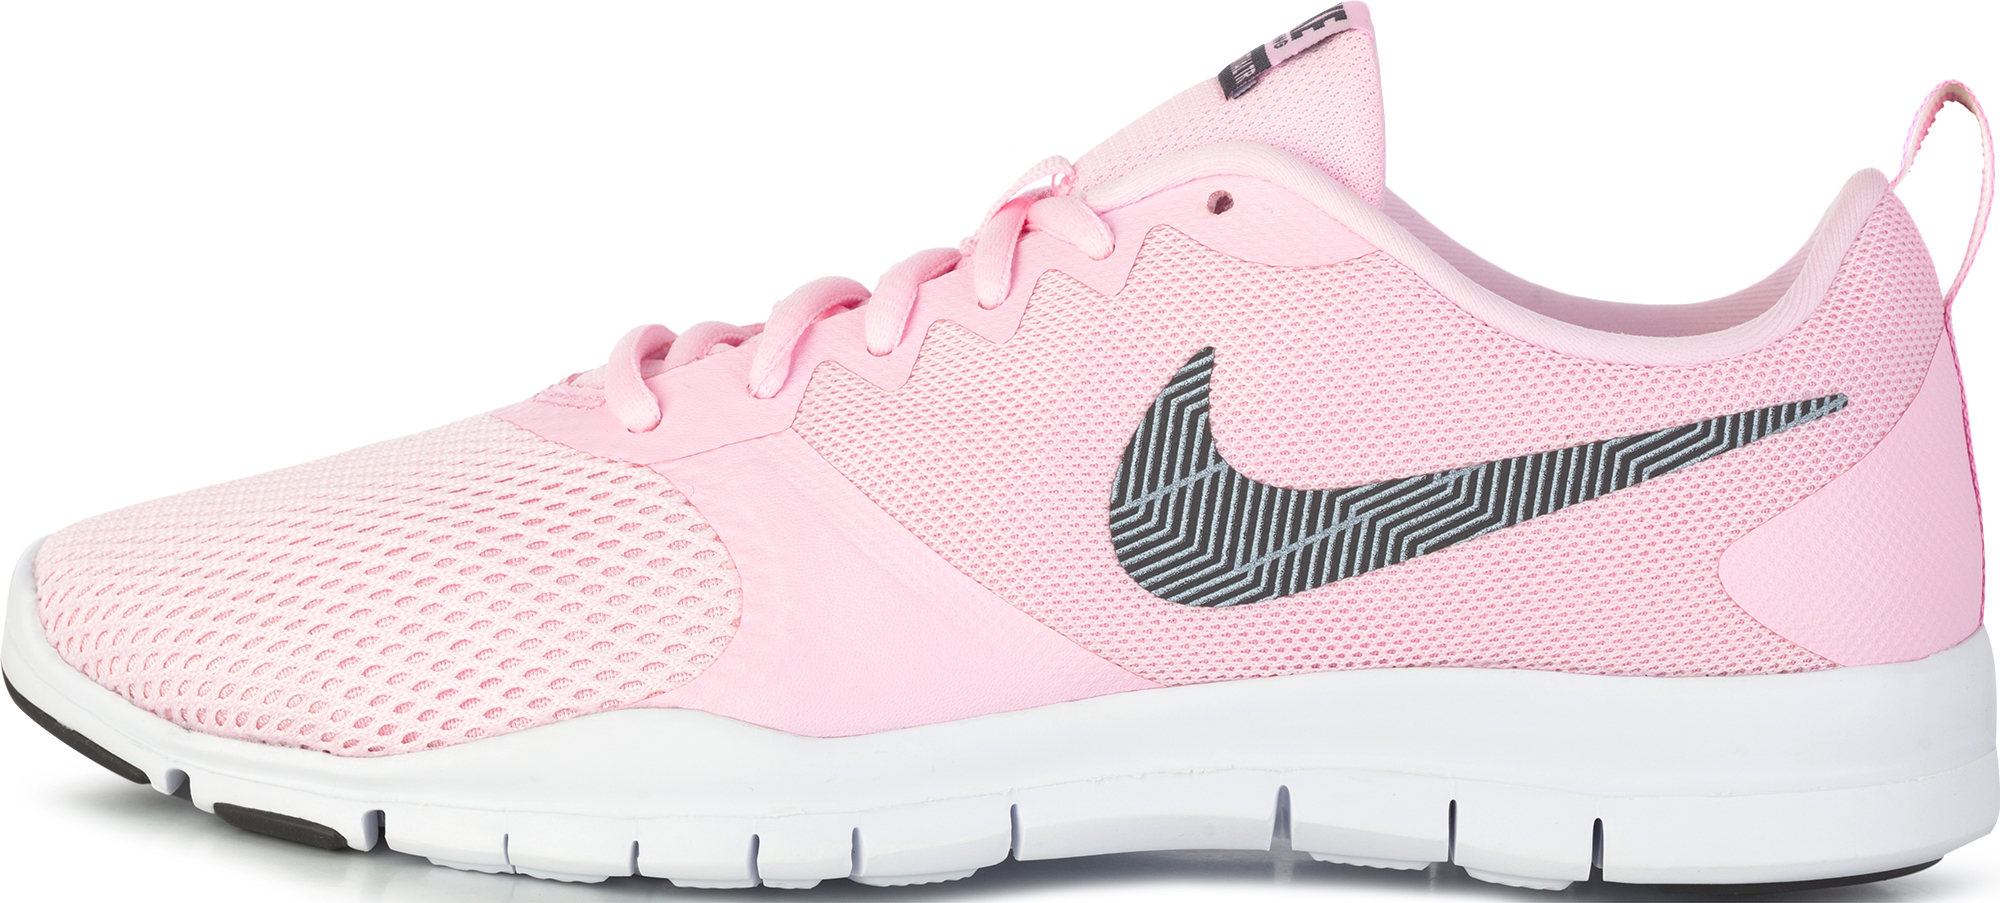 Nike Кроссовки женские Nike Flex Essential, размер 40 цена